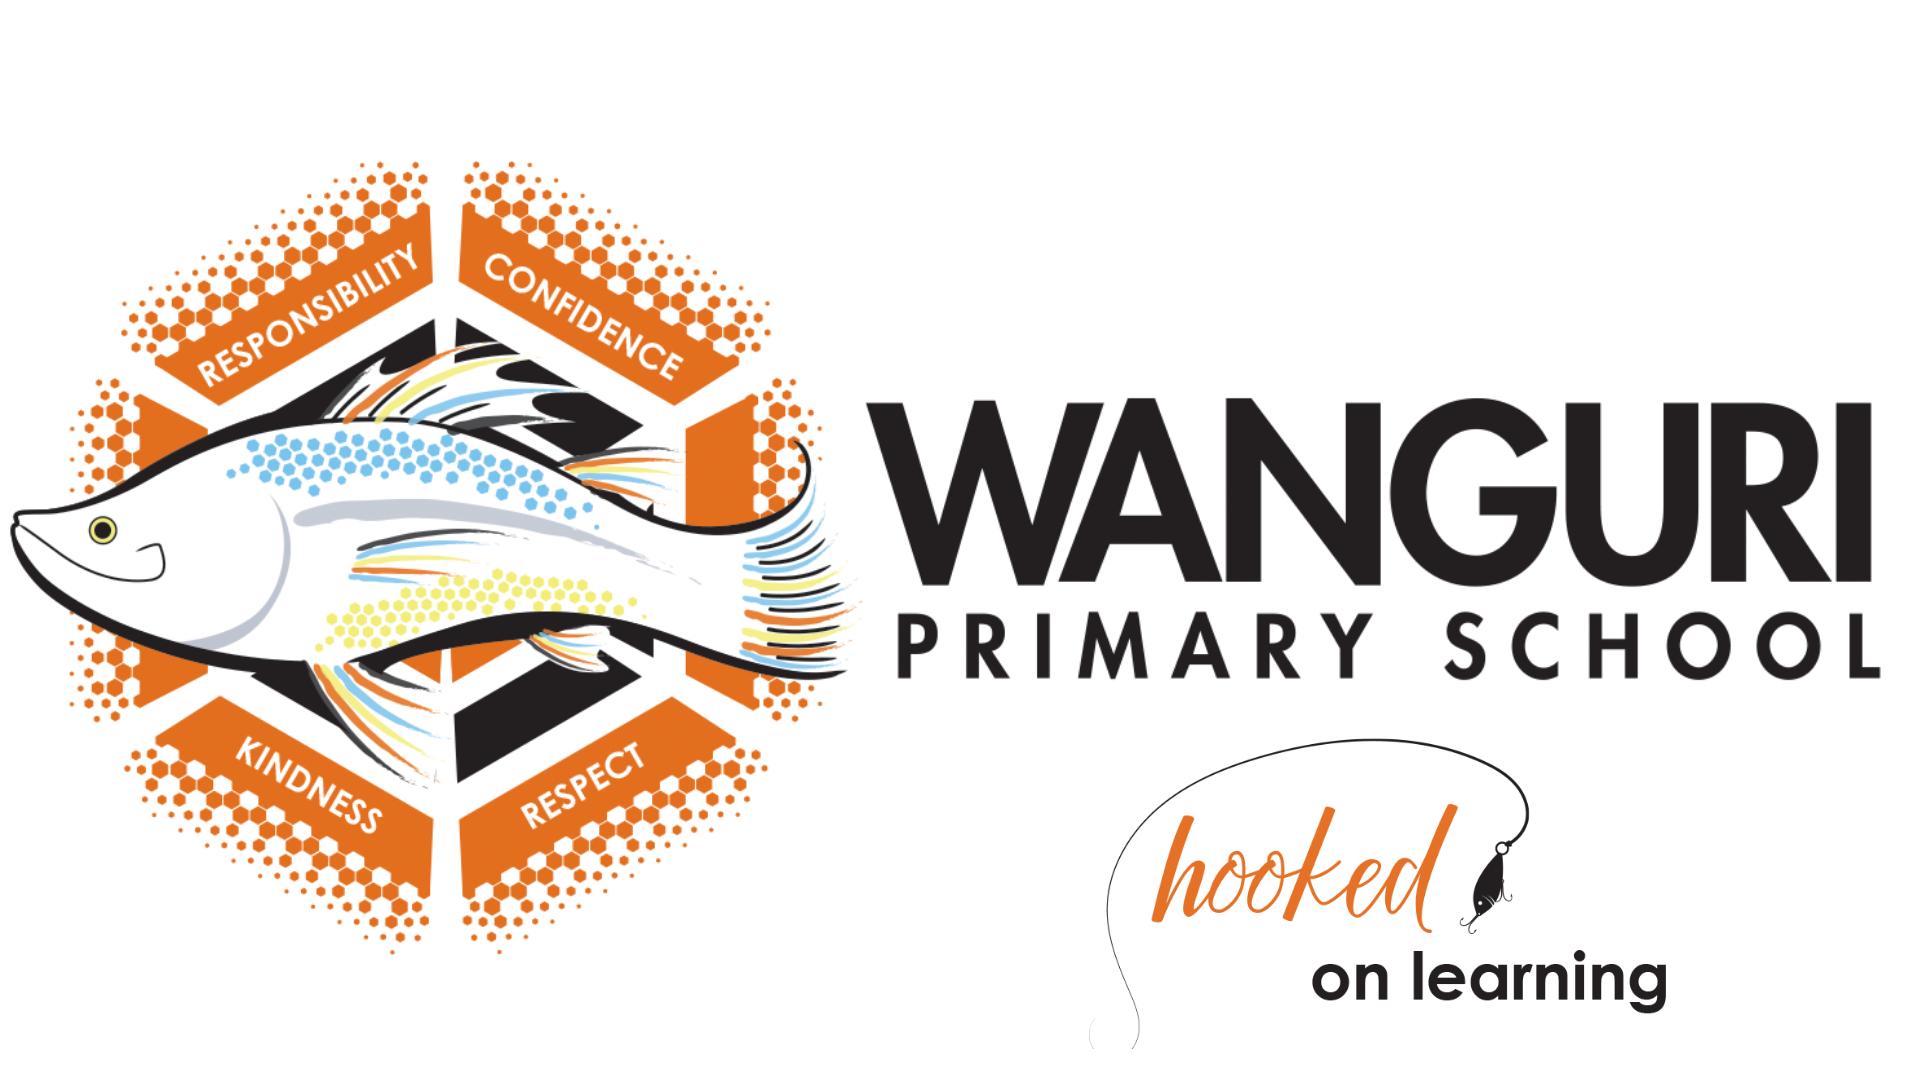 Wanguri Primary School